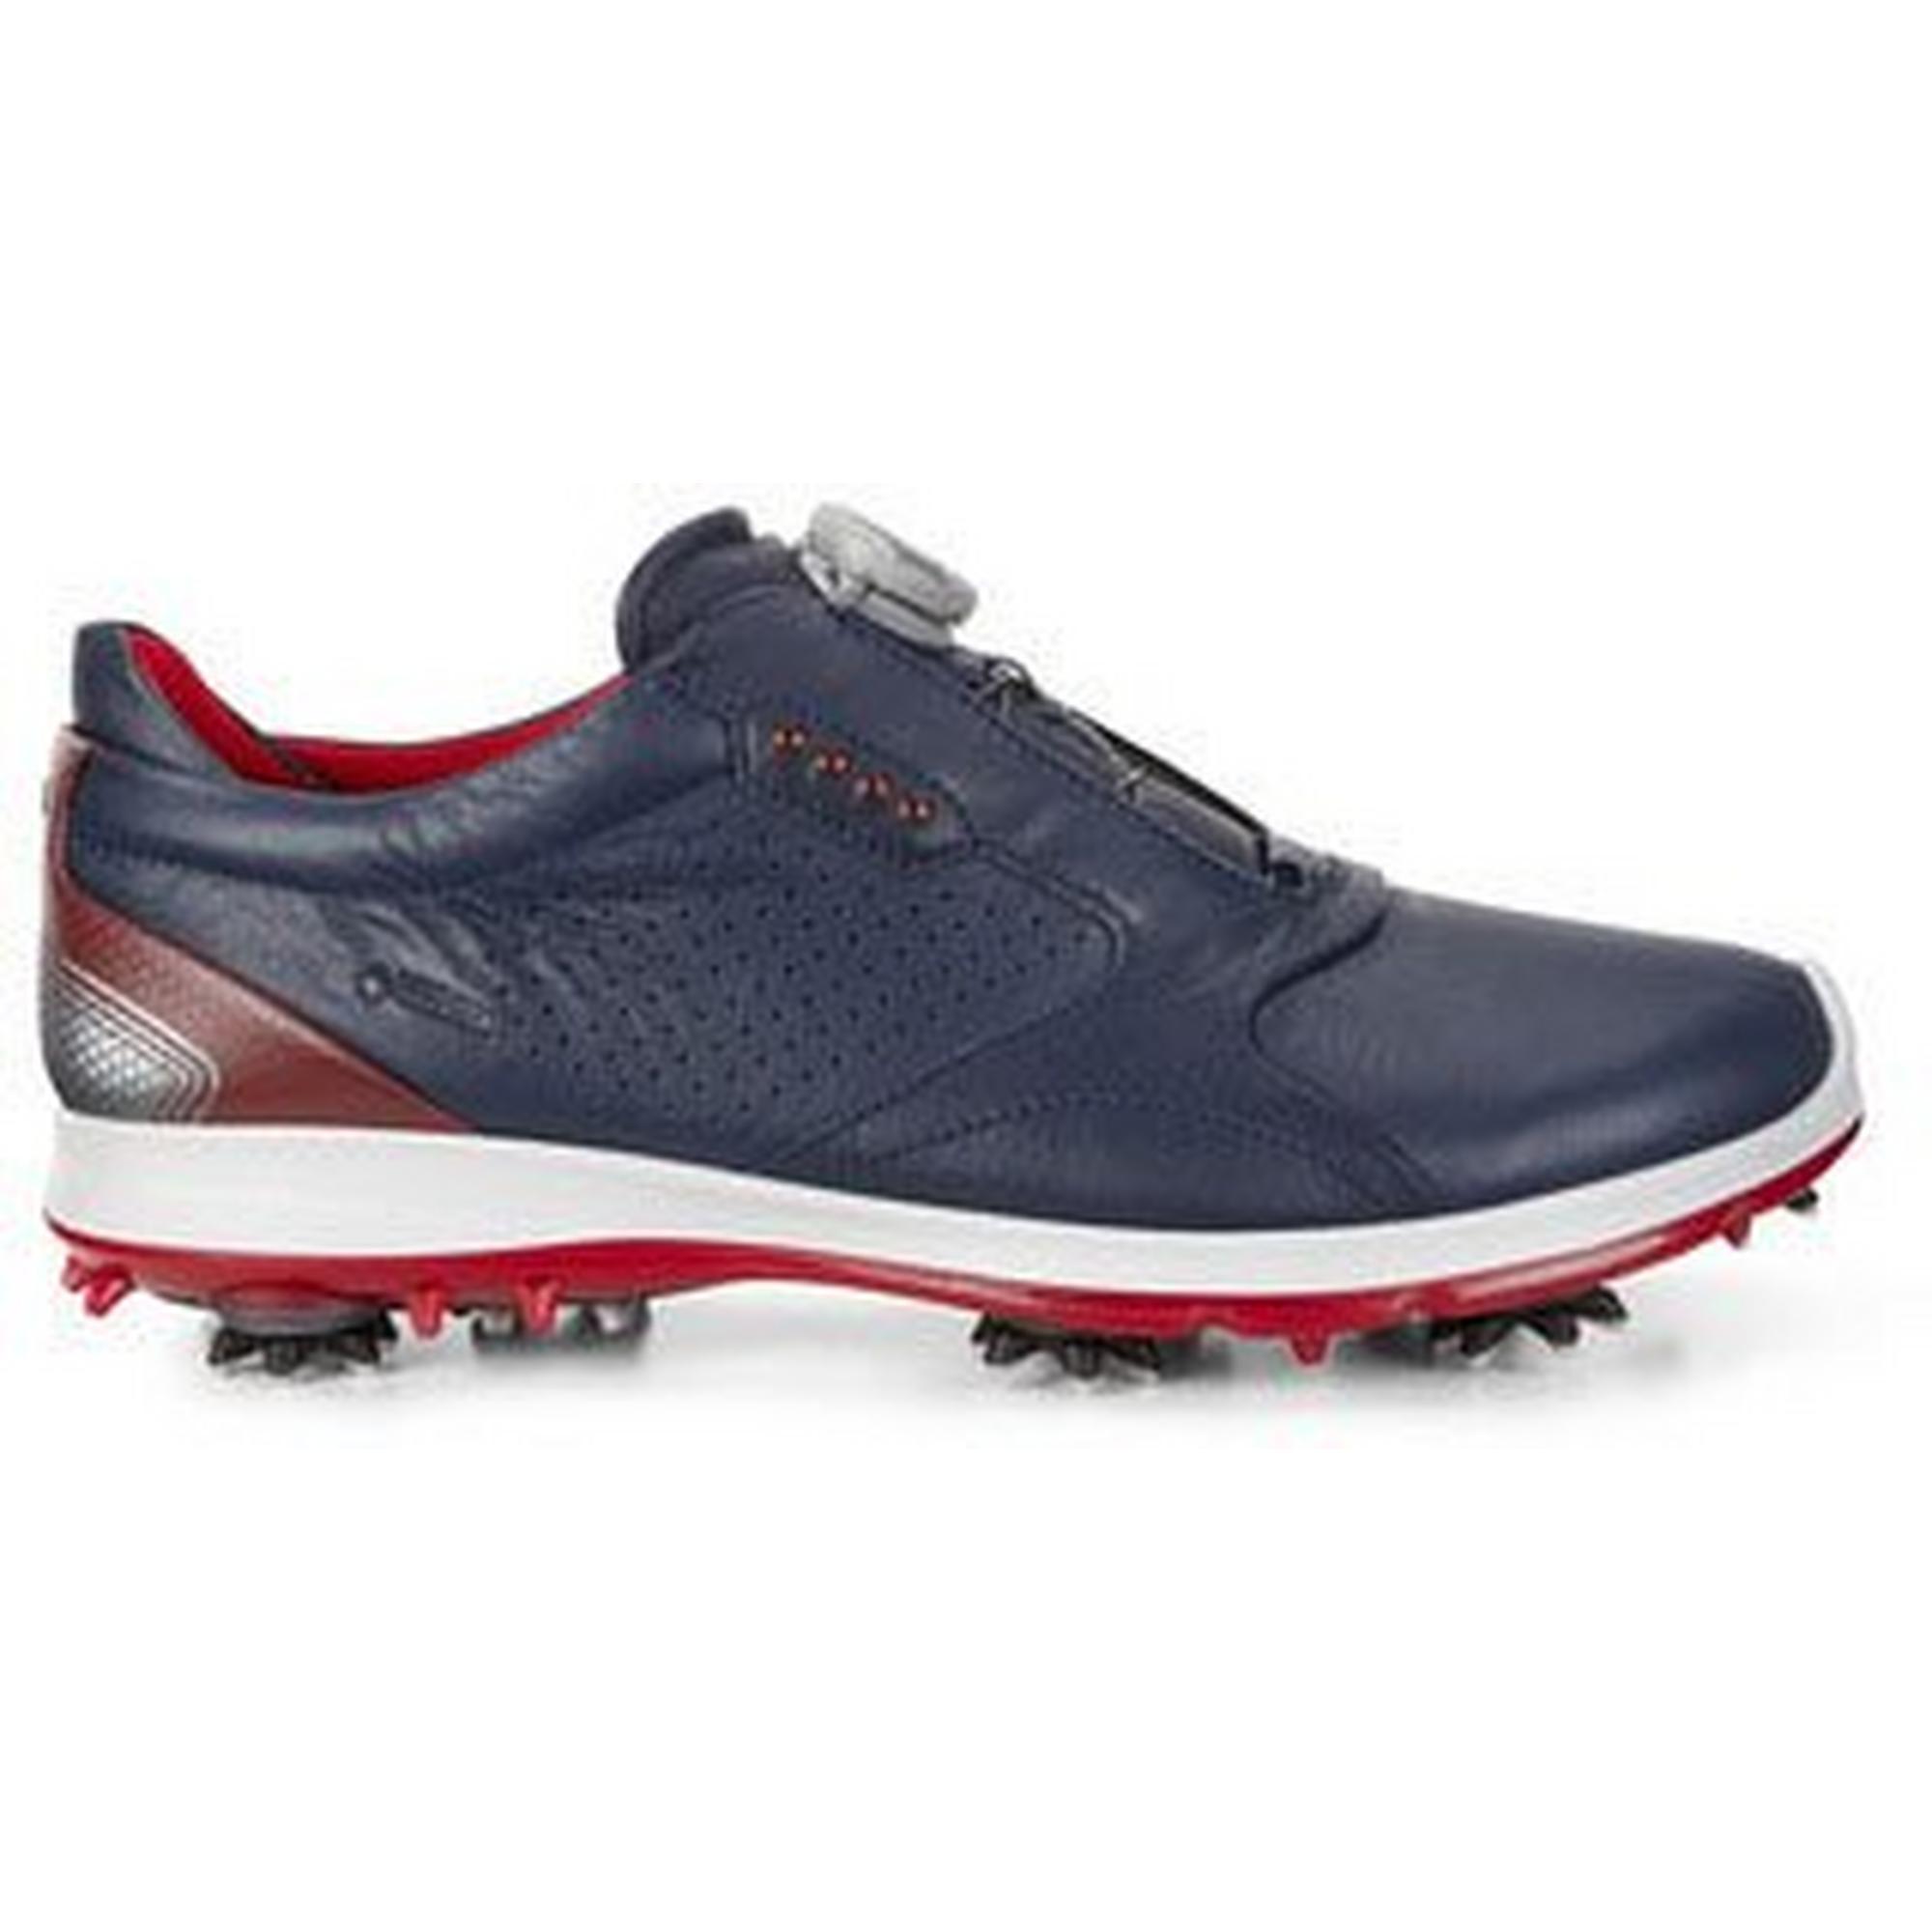 Men's 2018 Biom G2 Spiked Golf Shoe - Navy/Grey